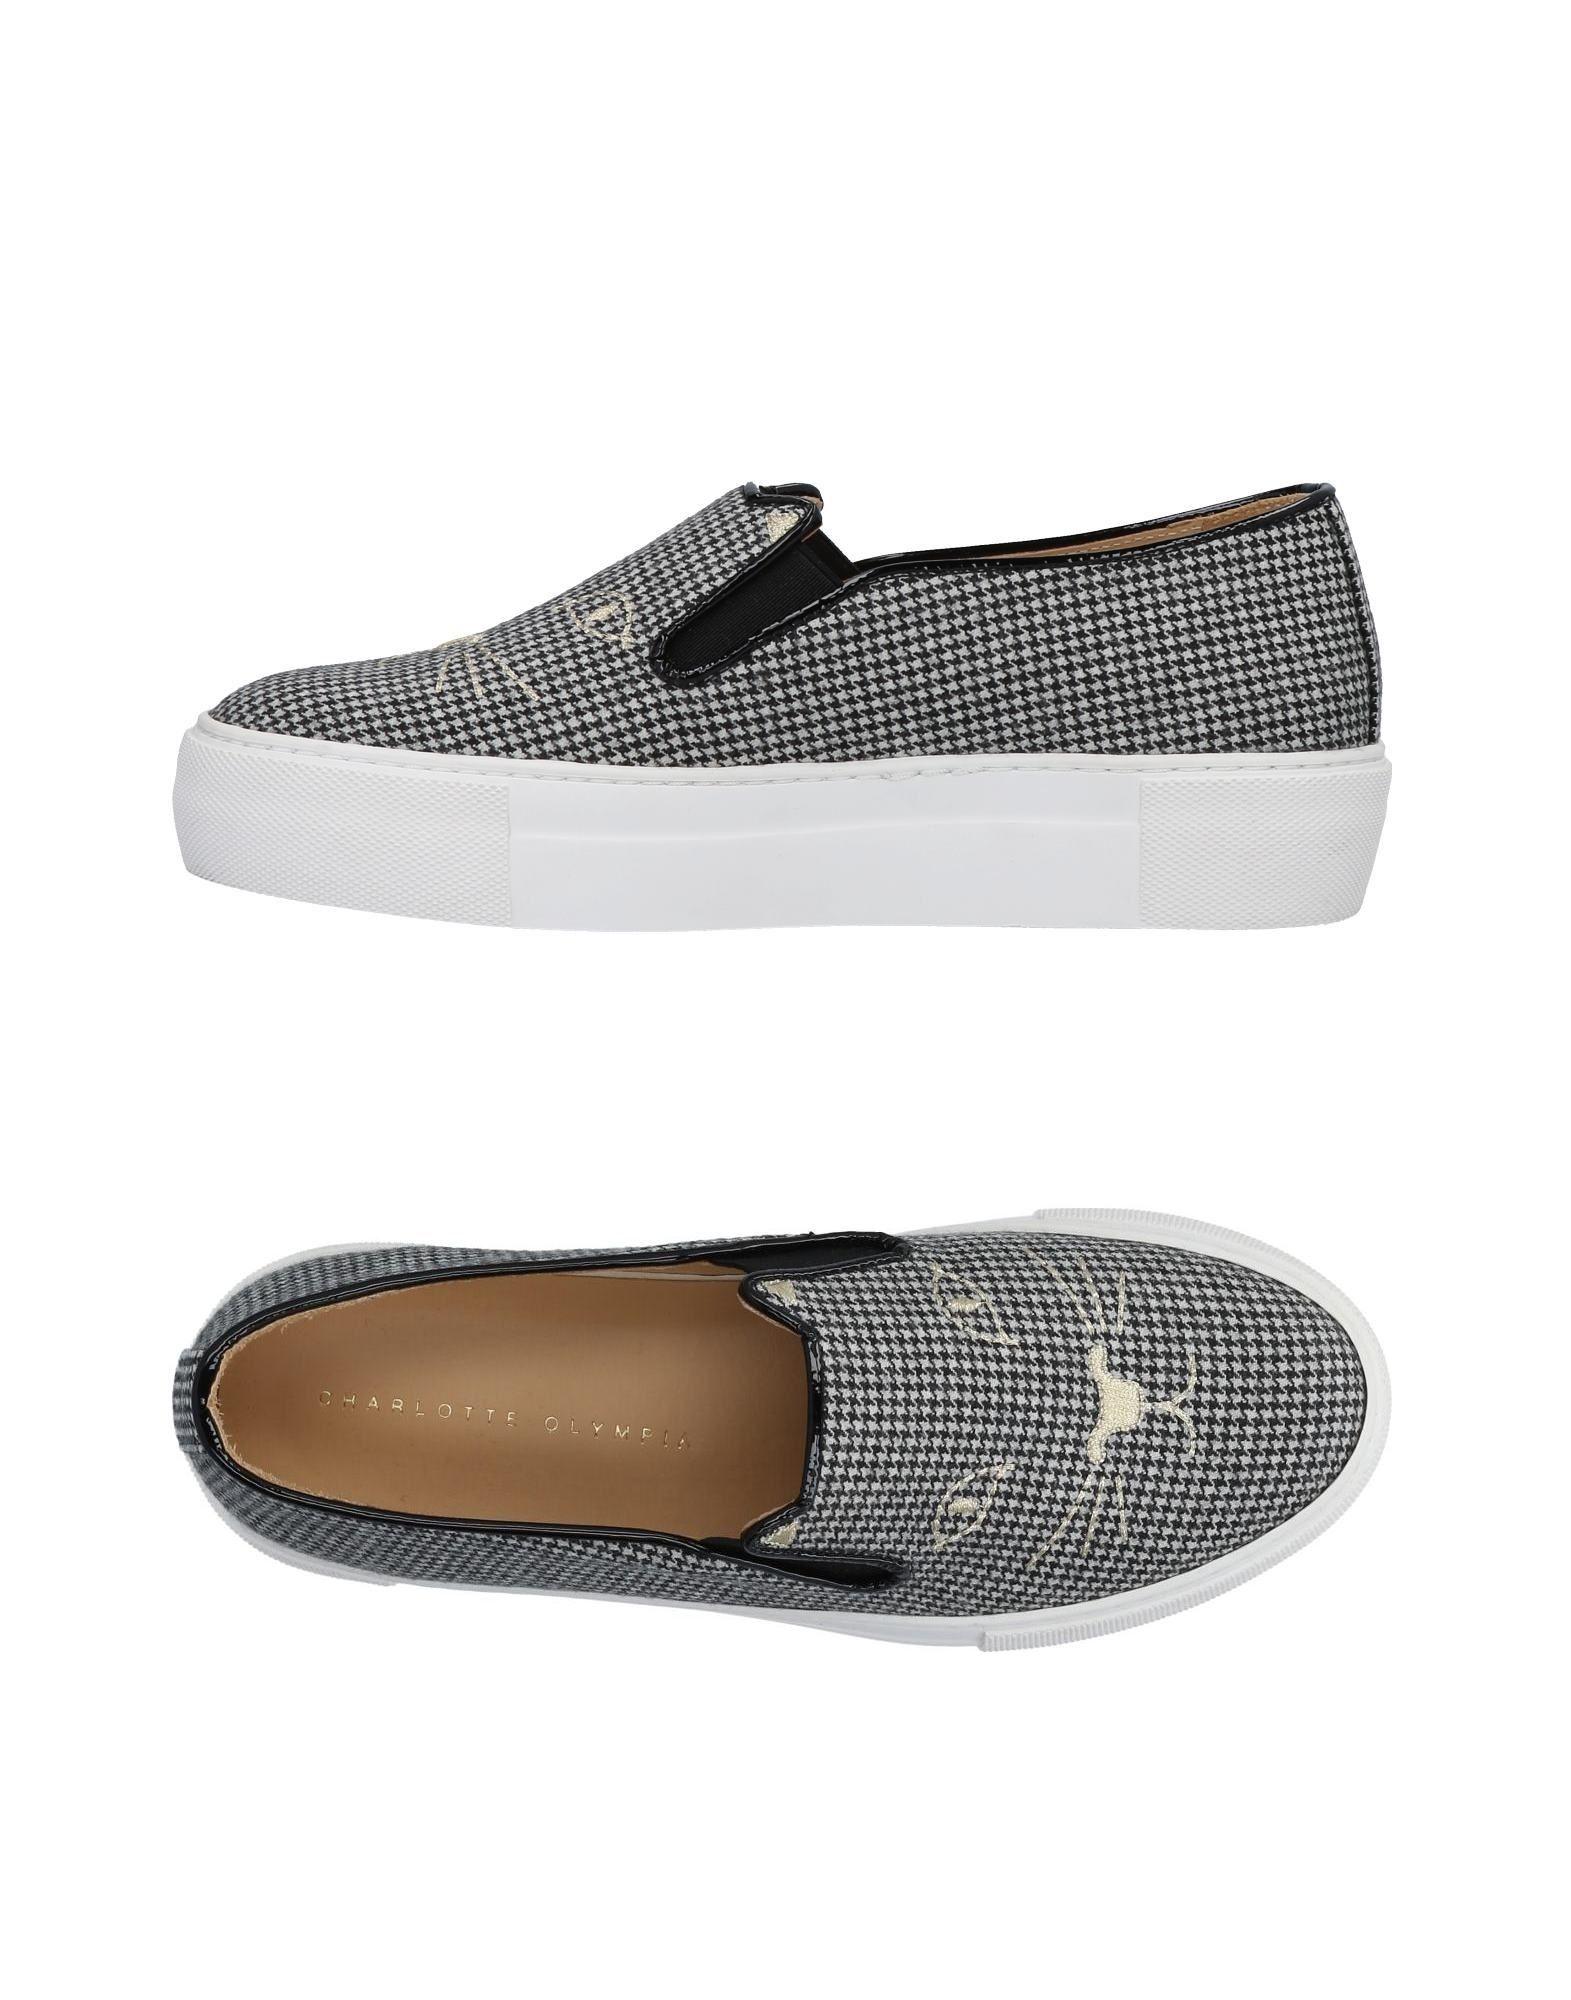 Rabatt Schuhe Charlotte Olympia Sneakers Damen  11480998ME